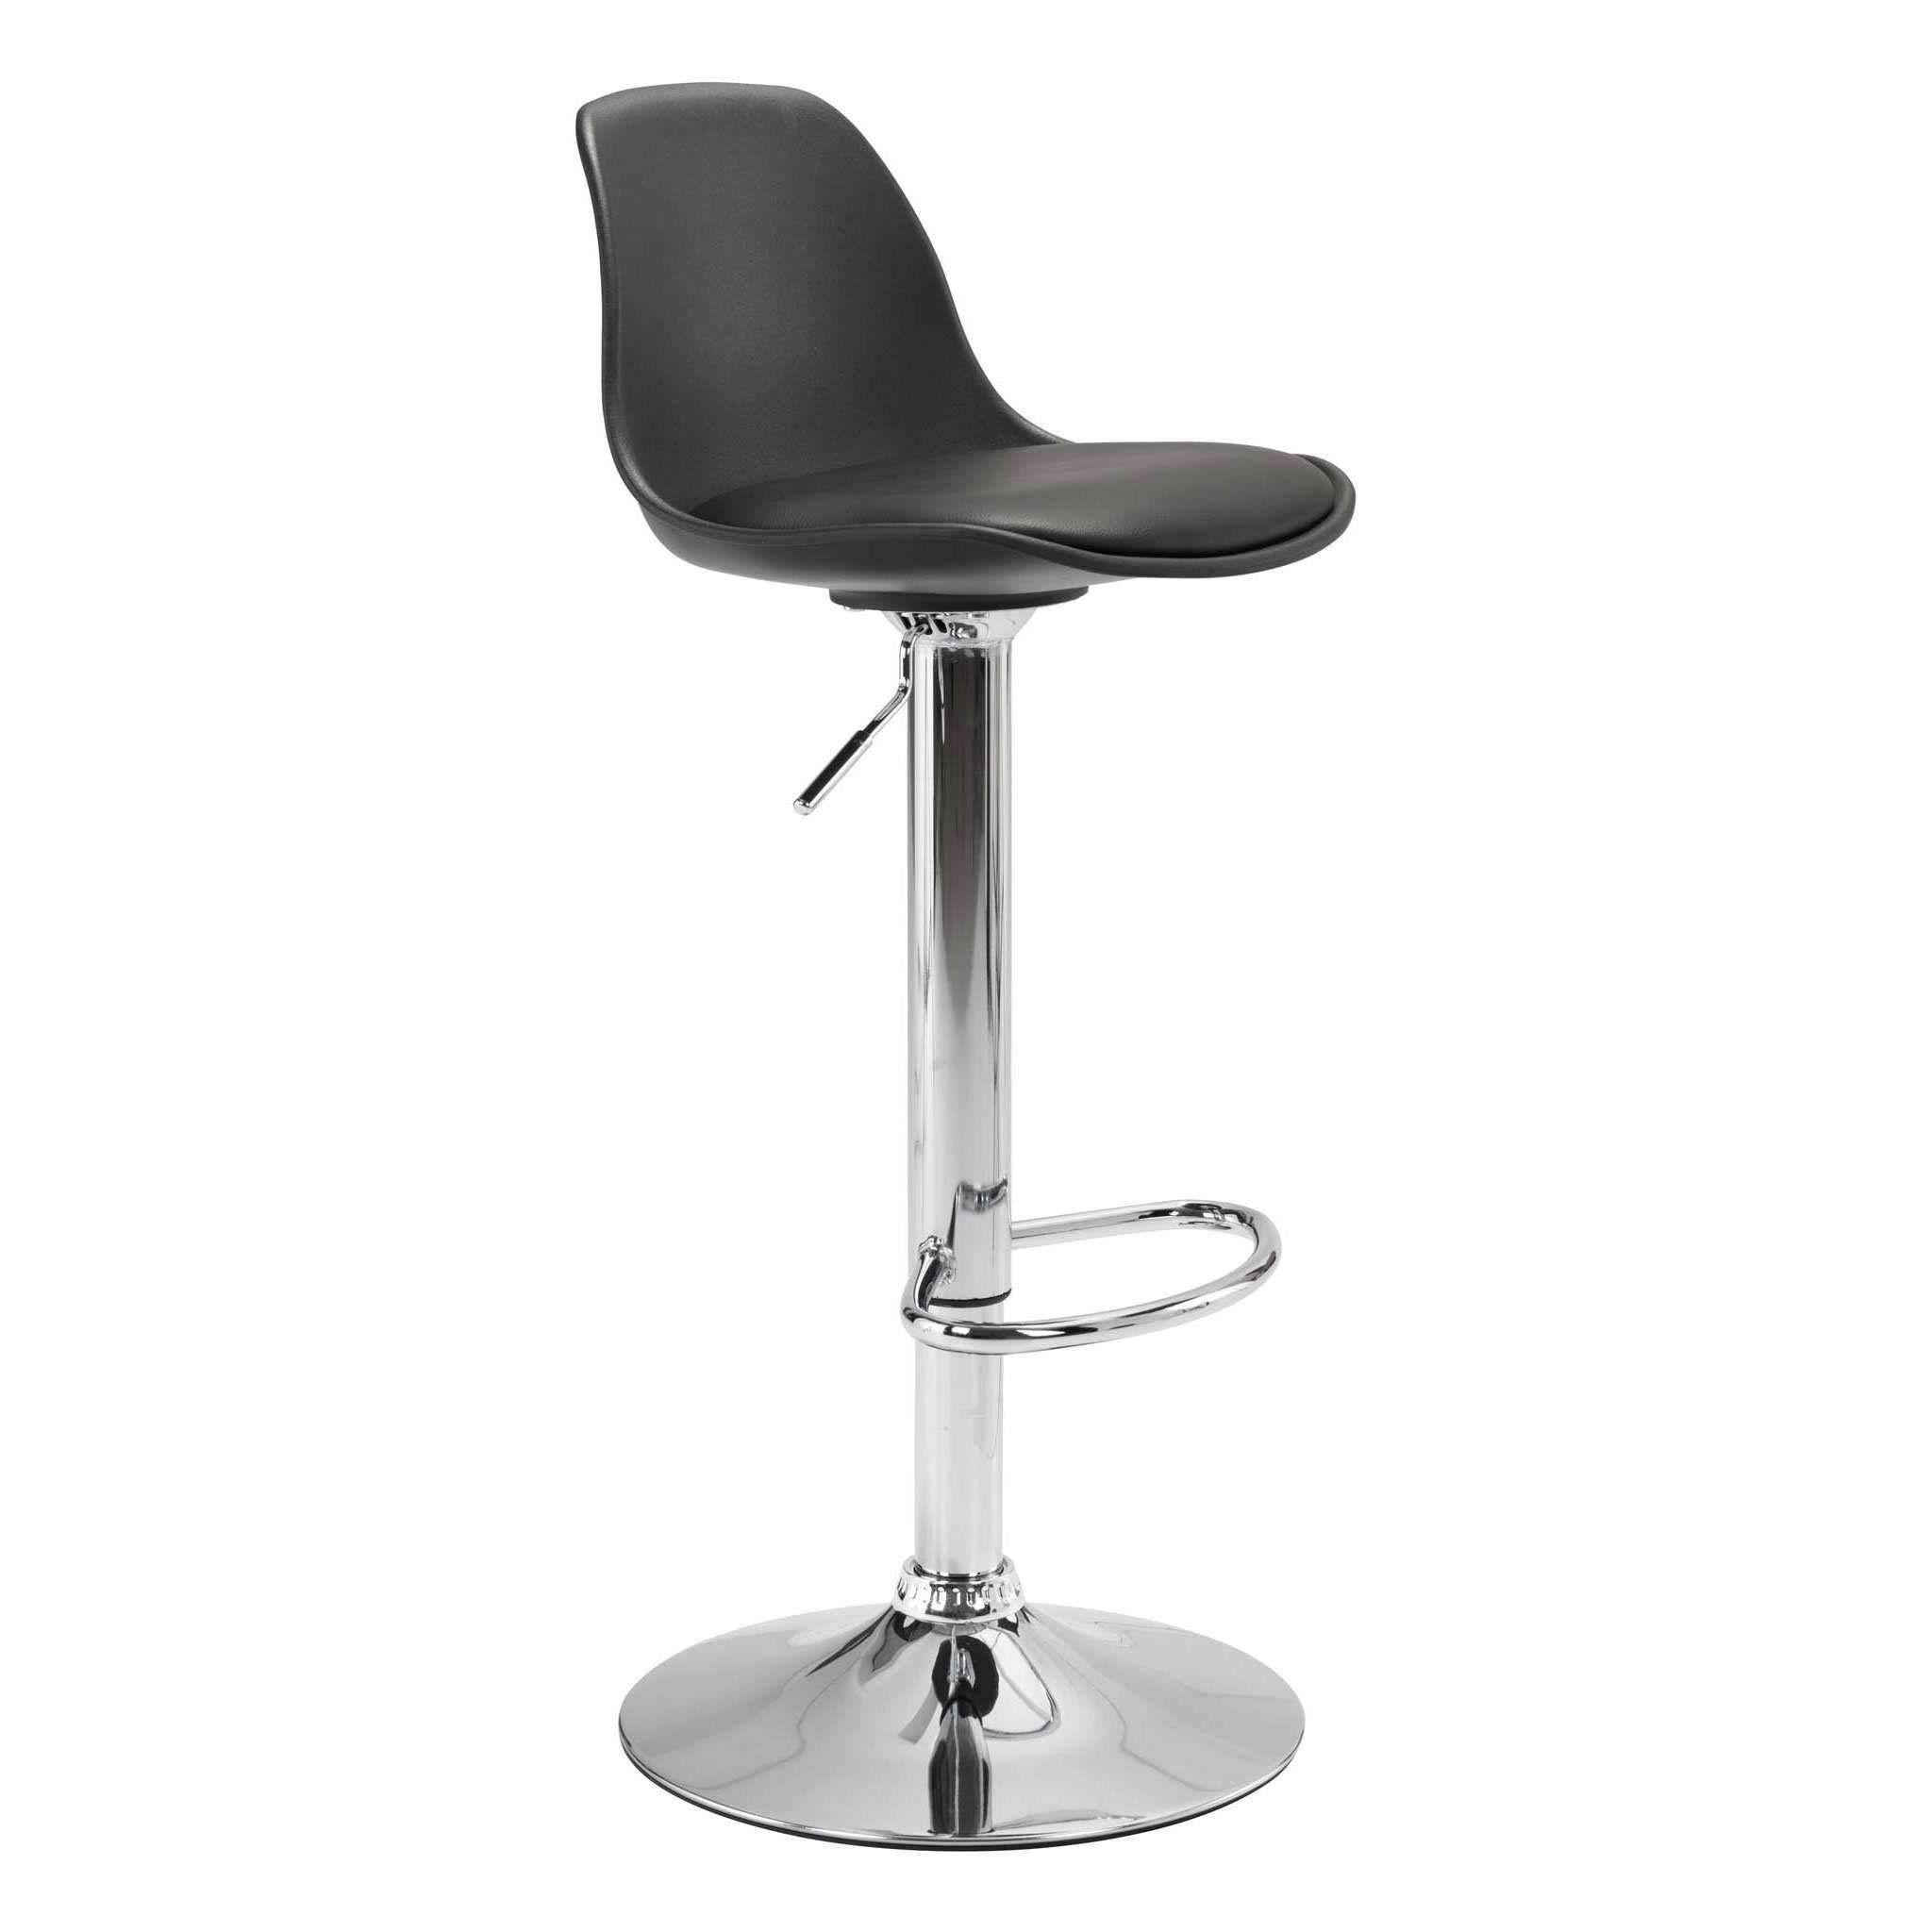 Gremlin Bar Chair  Products  Adjustable bar stools, Bar chairs